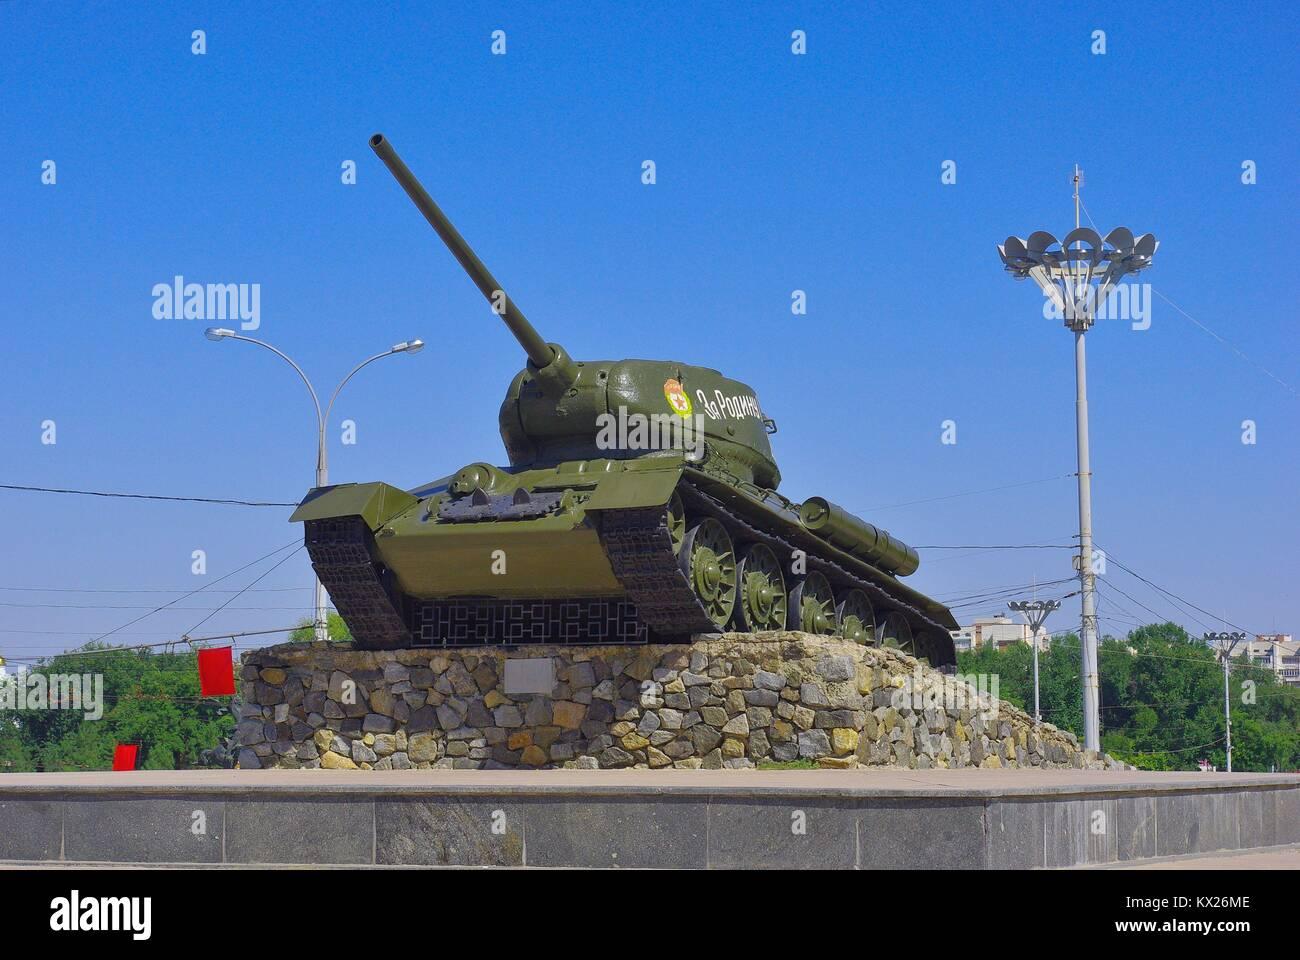 Tiraspol, the capital of Pridnestrovye (Transnistria), officially part of Republic of Moldova: The tank monument Stock Photo